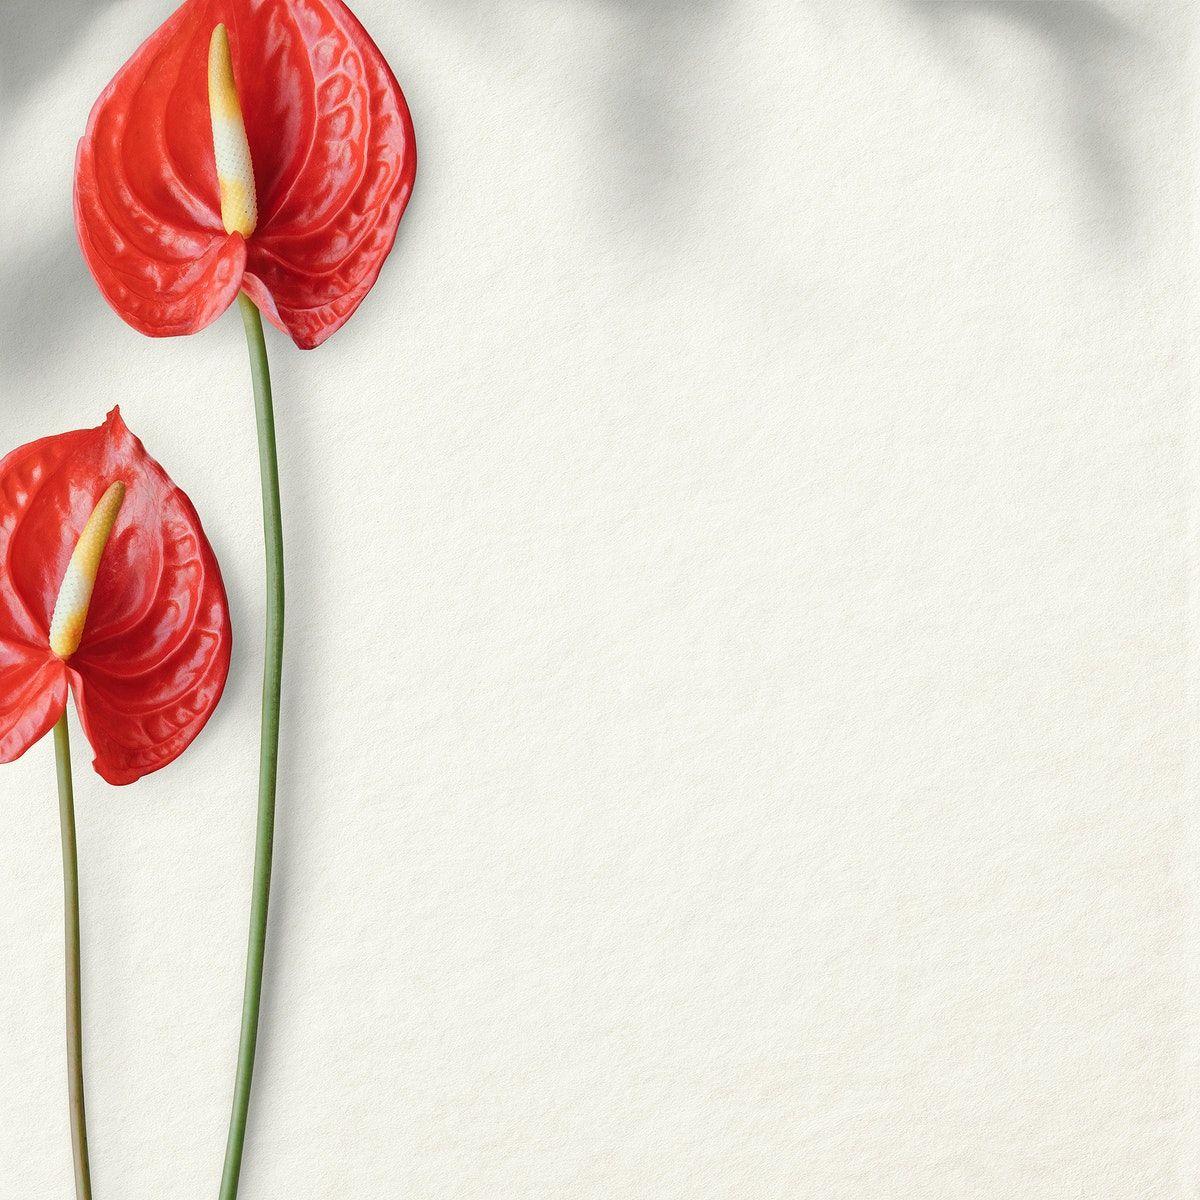 Download Premium Psd Of Flamingo Flower On A White Background Design In 2020 Flamingo Flower Background Design Anthurium Flower